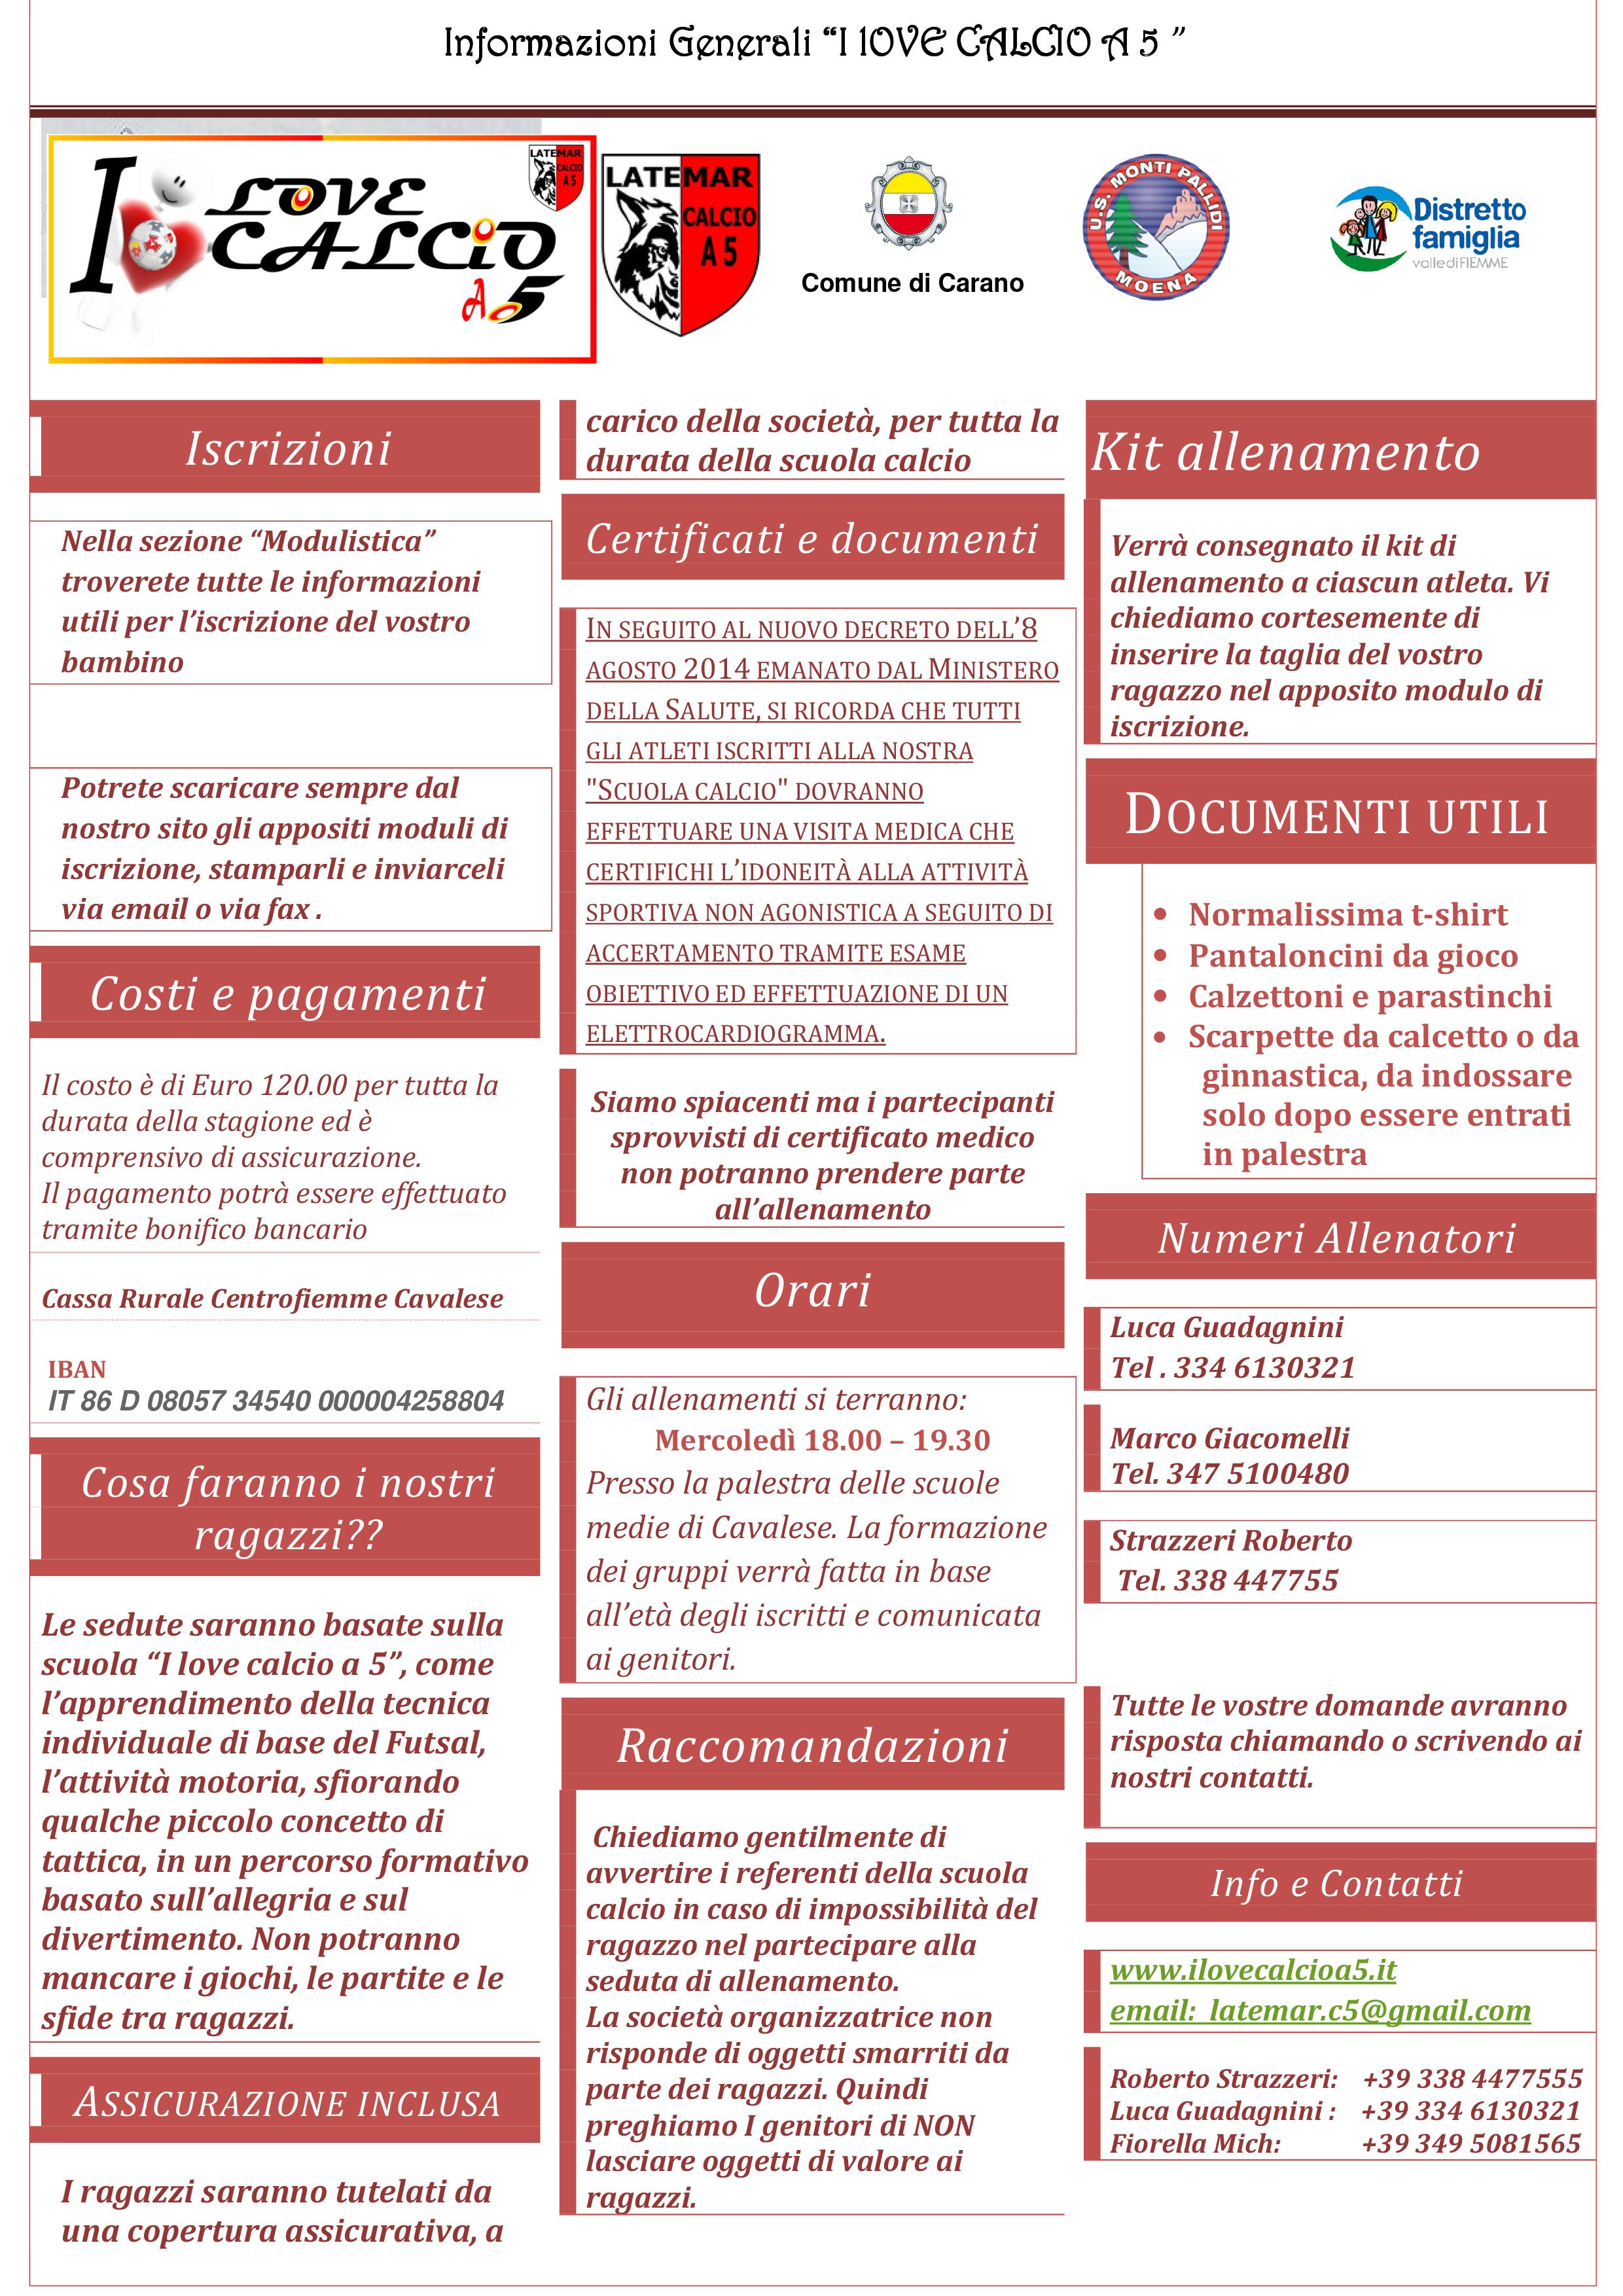 info-generali-pdf